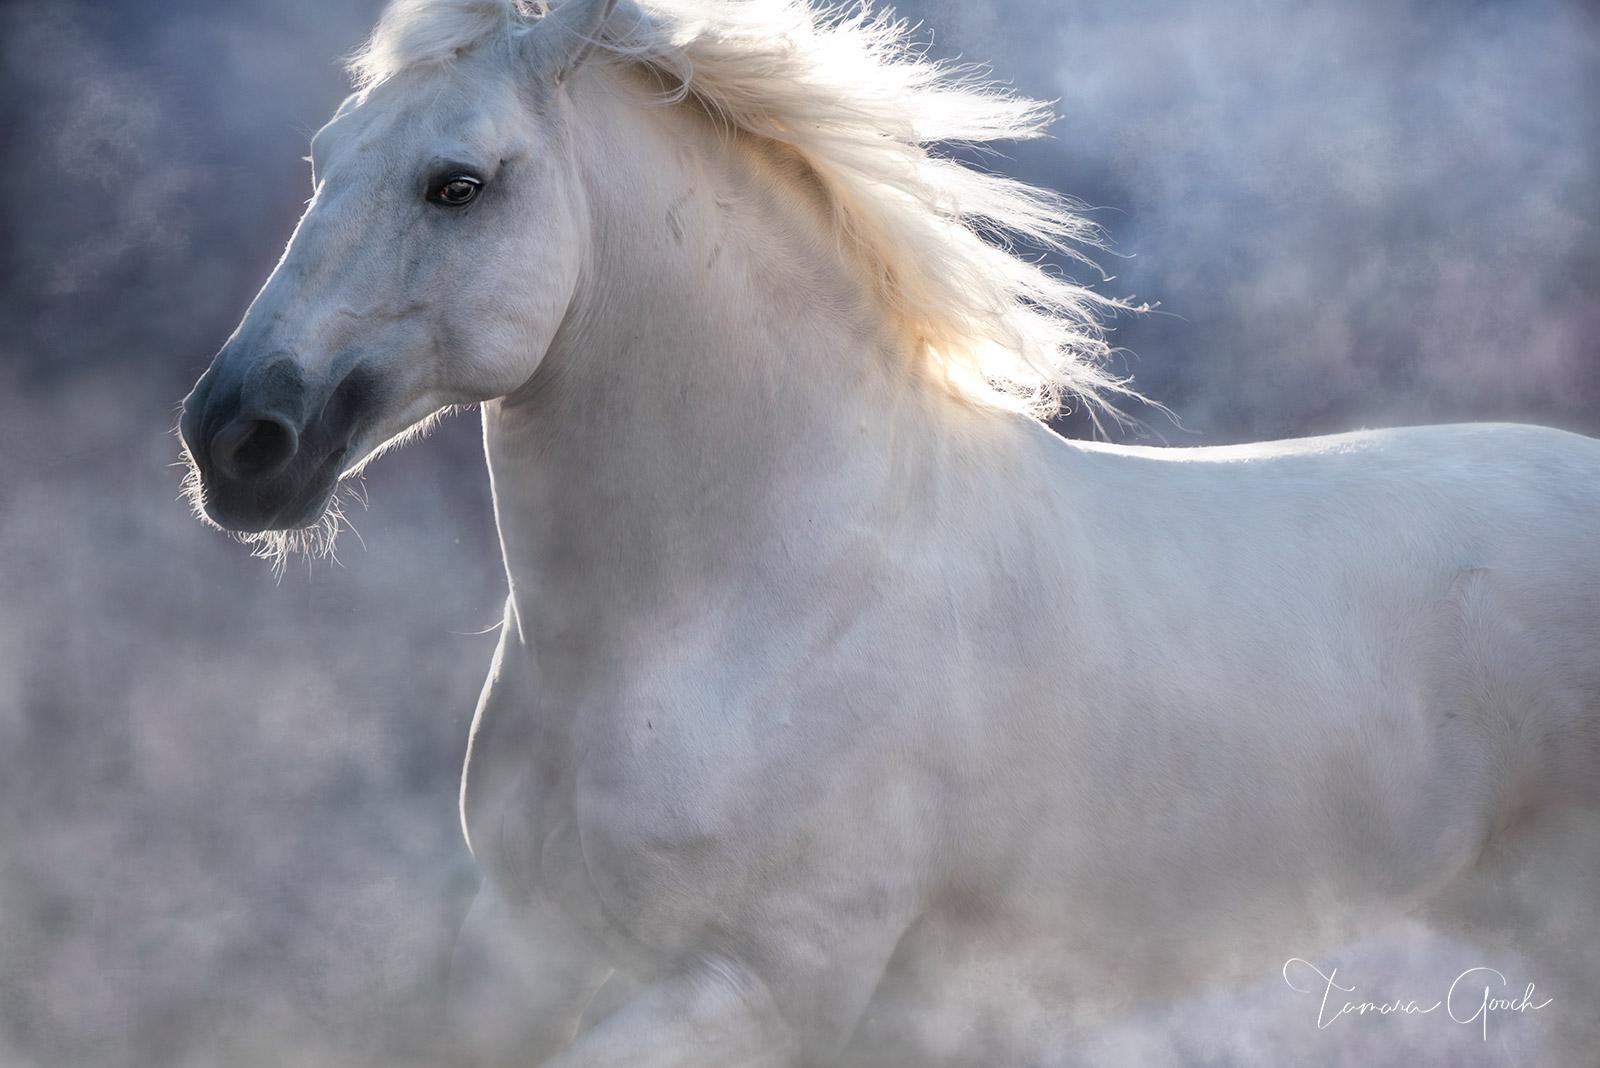 Lusitano Horse limited edition fine art print, Equestrian art, artwork, Portugal, Iberian, white, stallion, horse, equine, sophisticated, luxury, fine, art, limited, edition, print, home, decor, inter, photo